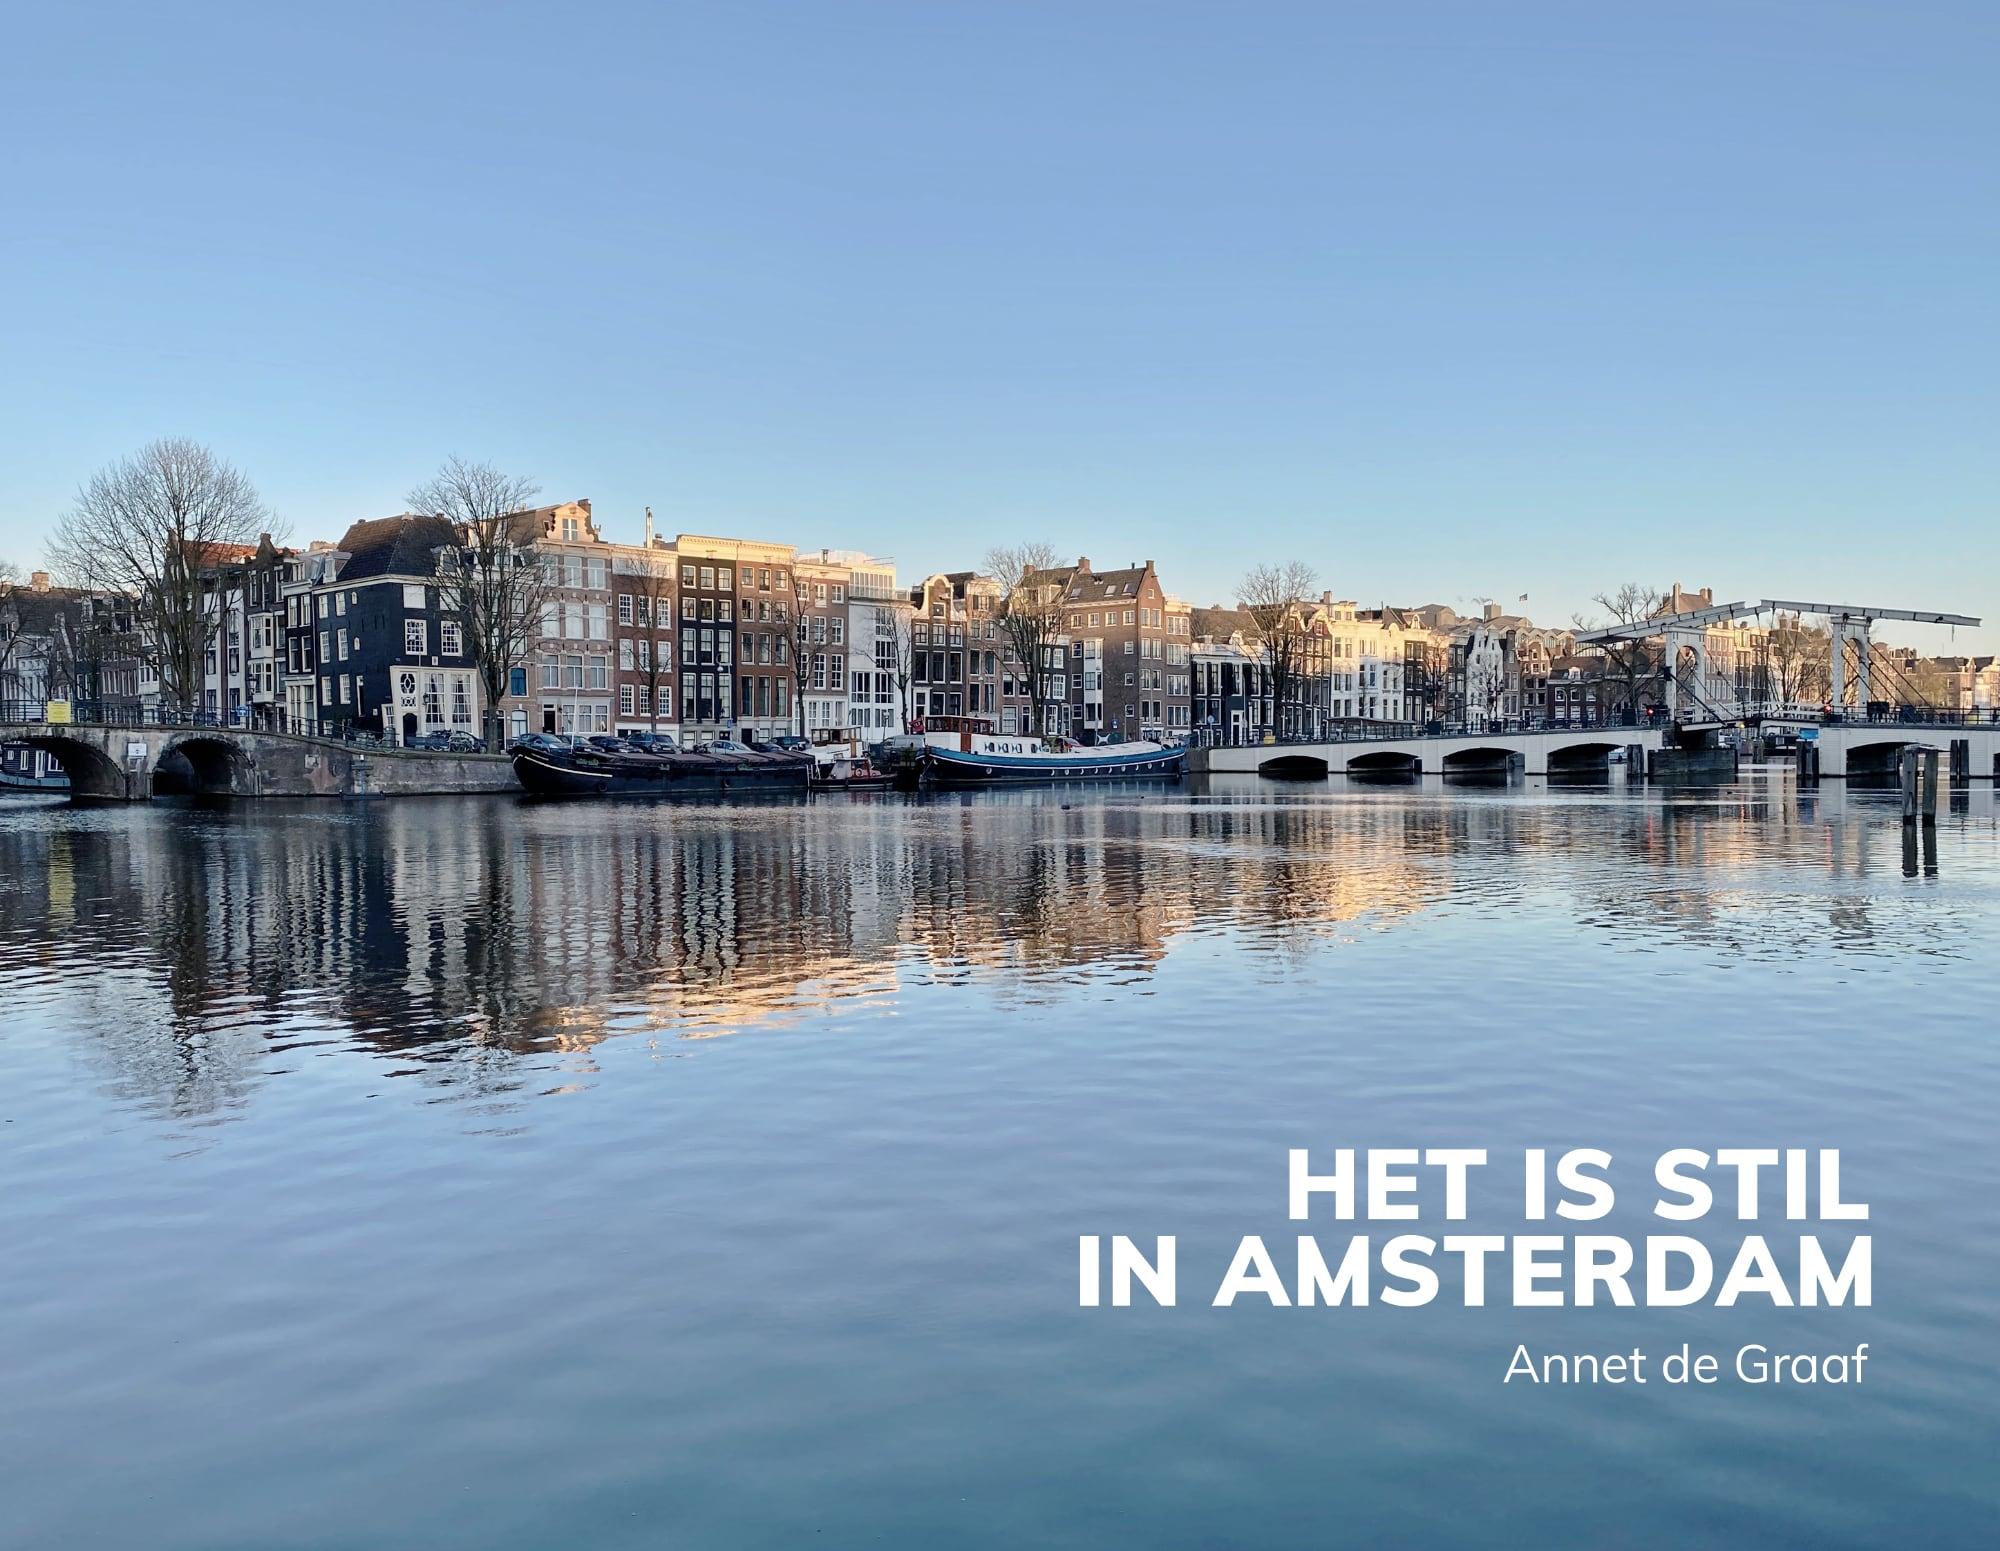 Het is stil in Amsterdam - Annet de Graaf, isbn 9789043922623, coverfoto